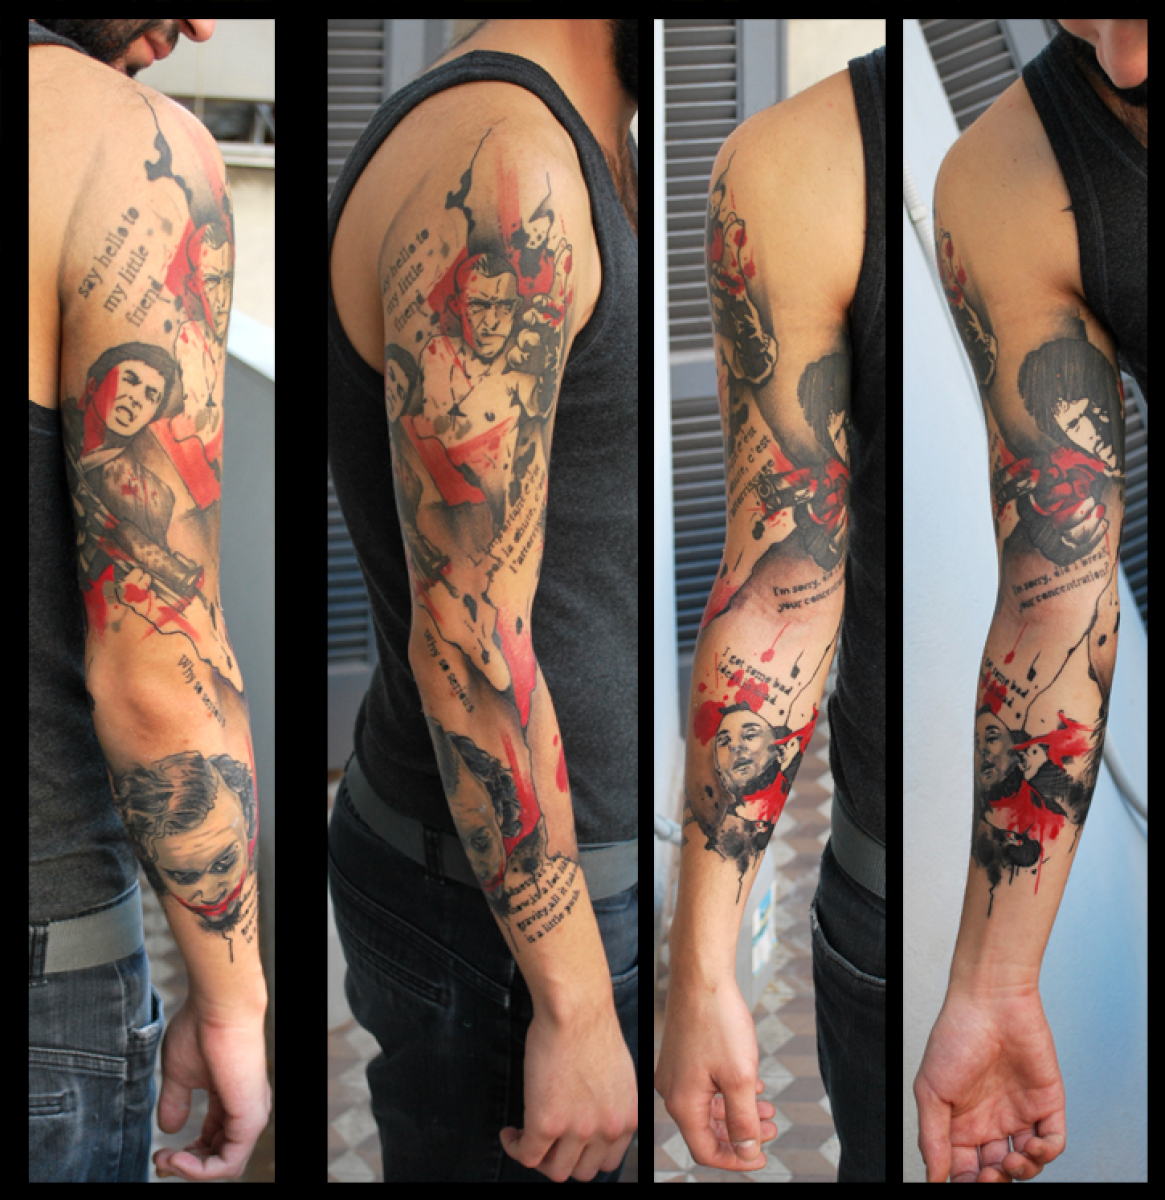 Gangsters Trash Polka tattoo sleeve by Live Two